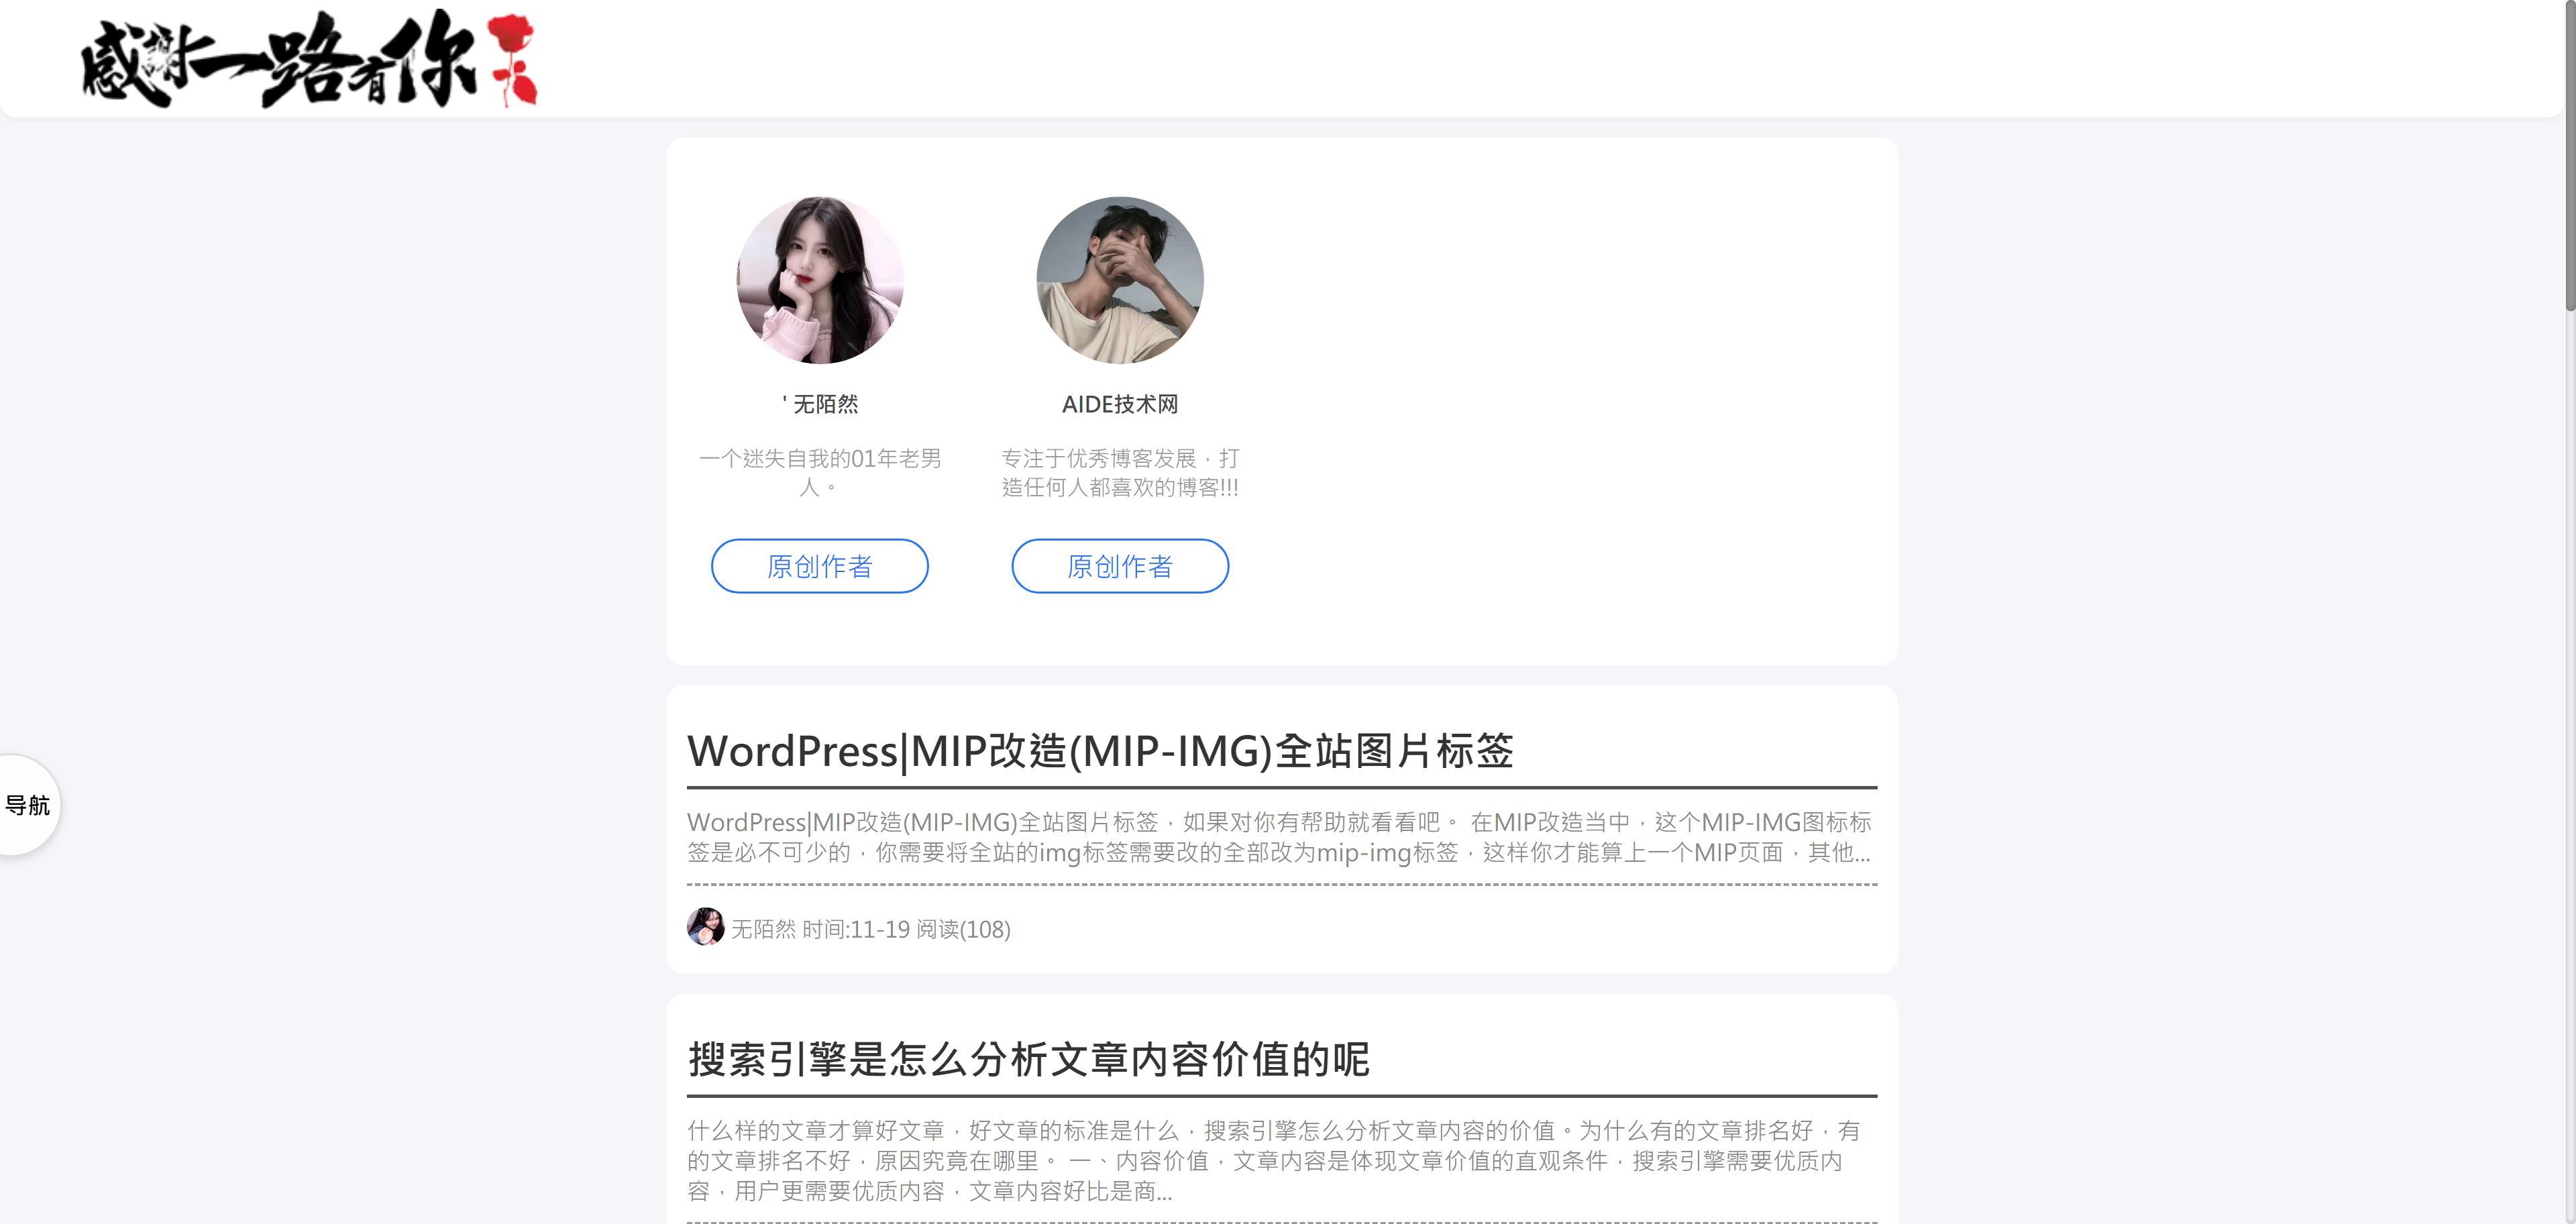 WordPress|MIP改造实战建立一个页面(终章)|正文